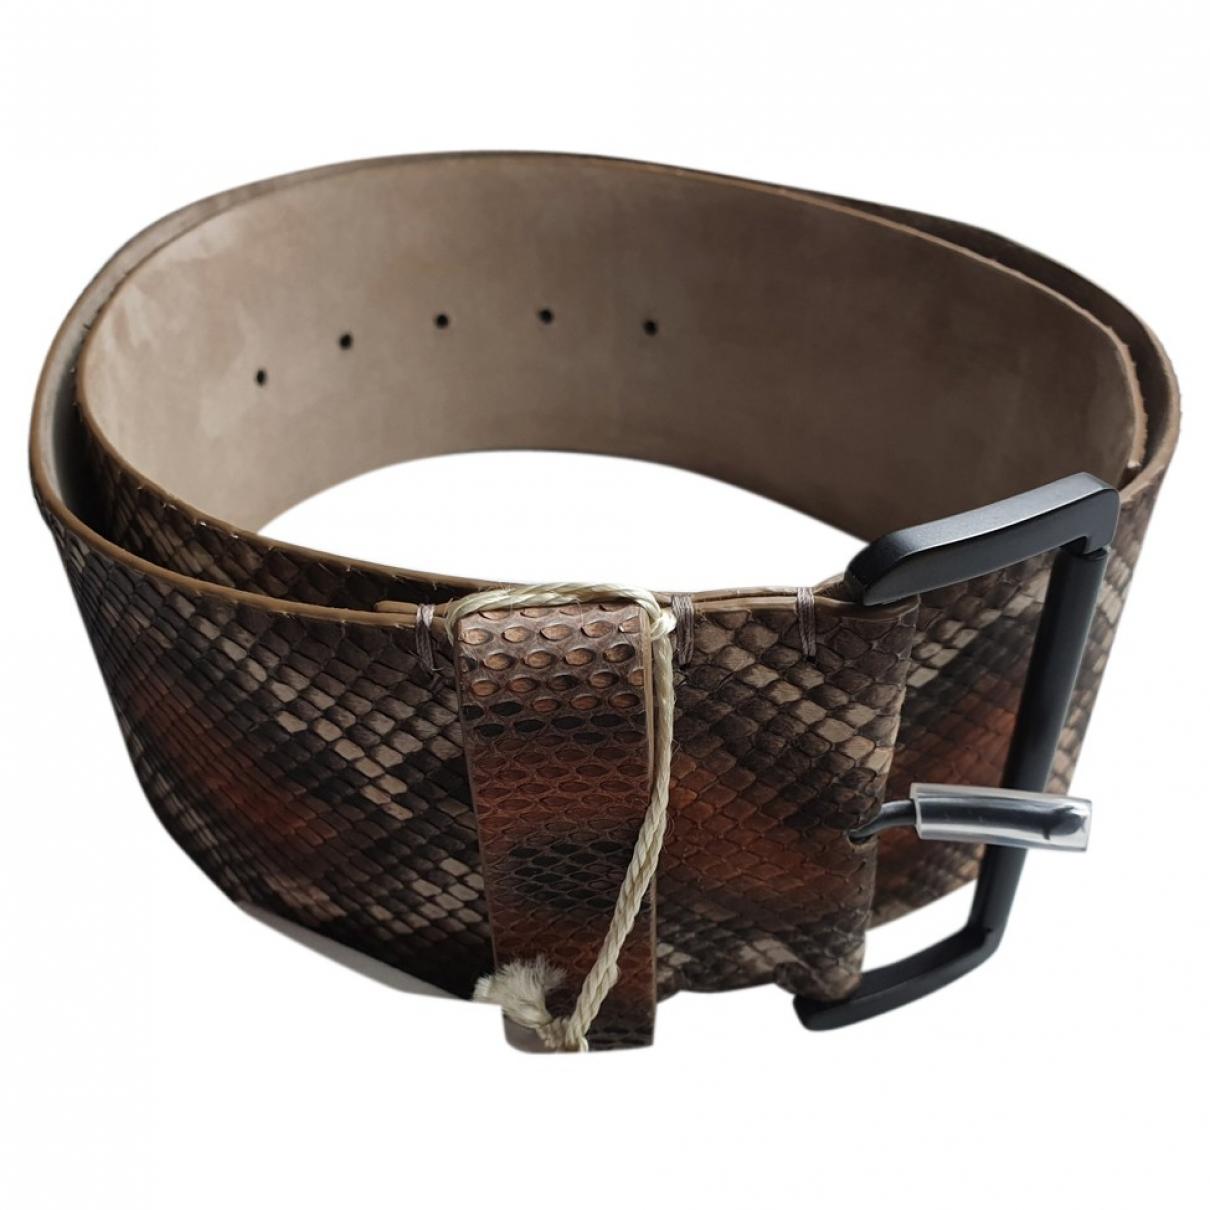 Cinturon de Piton Brunello Cucinelli